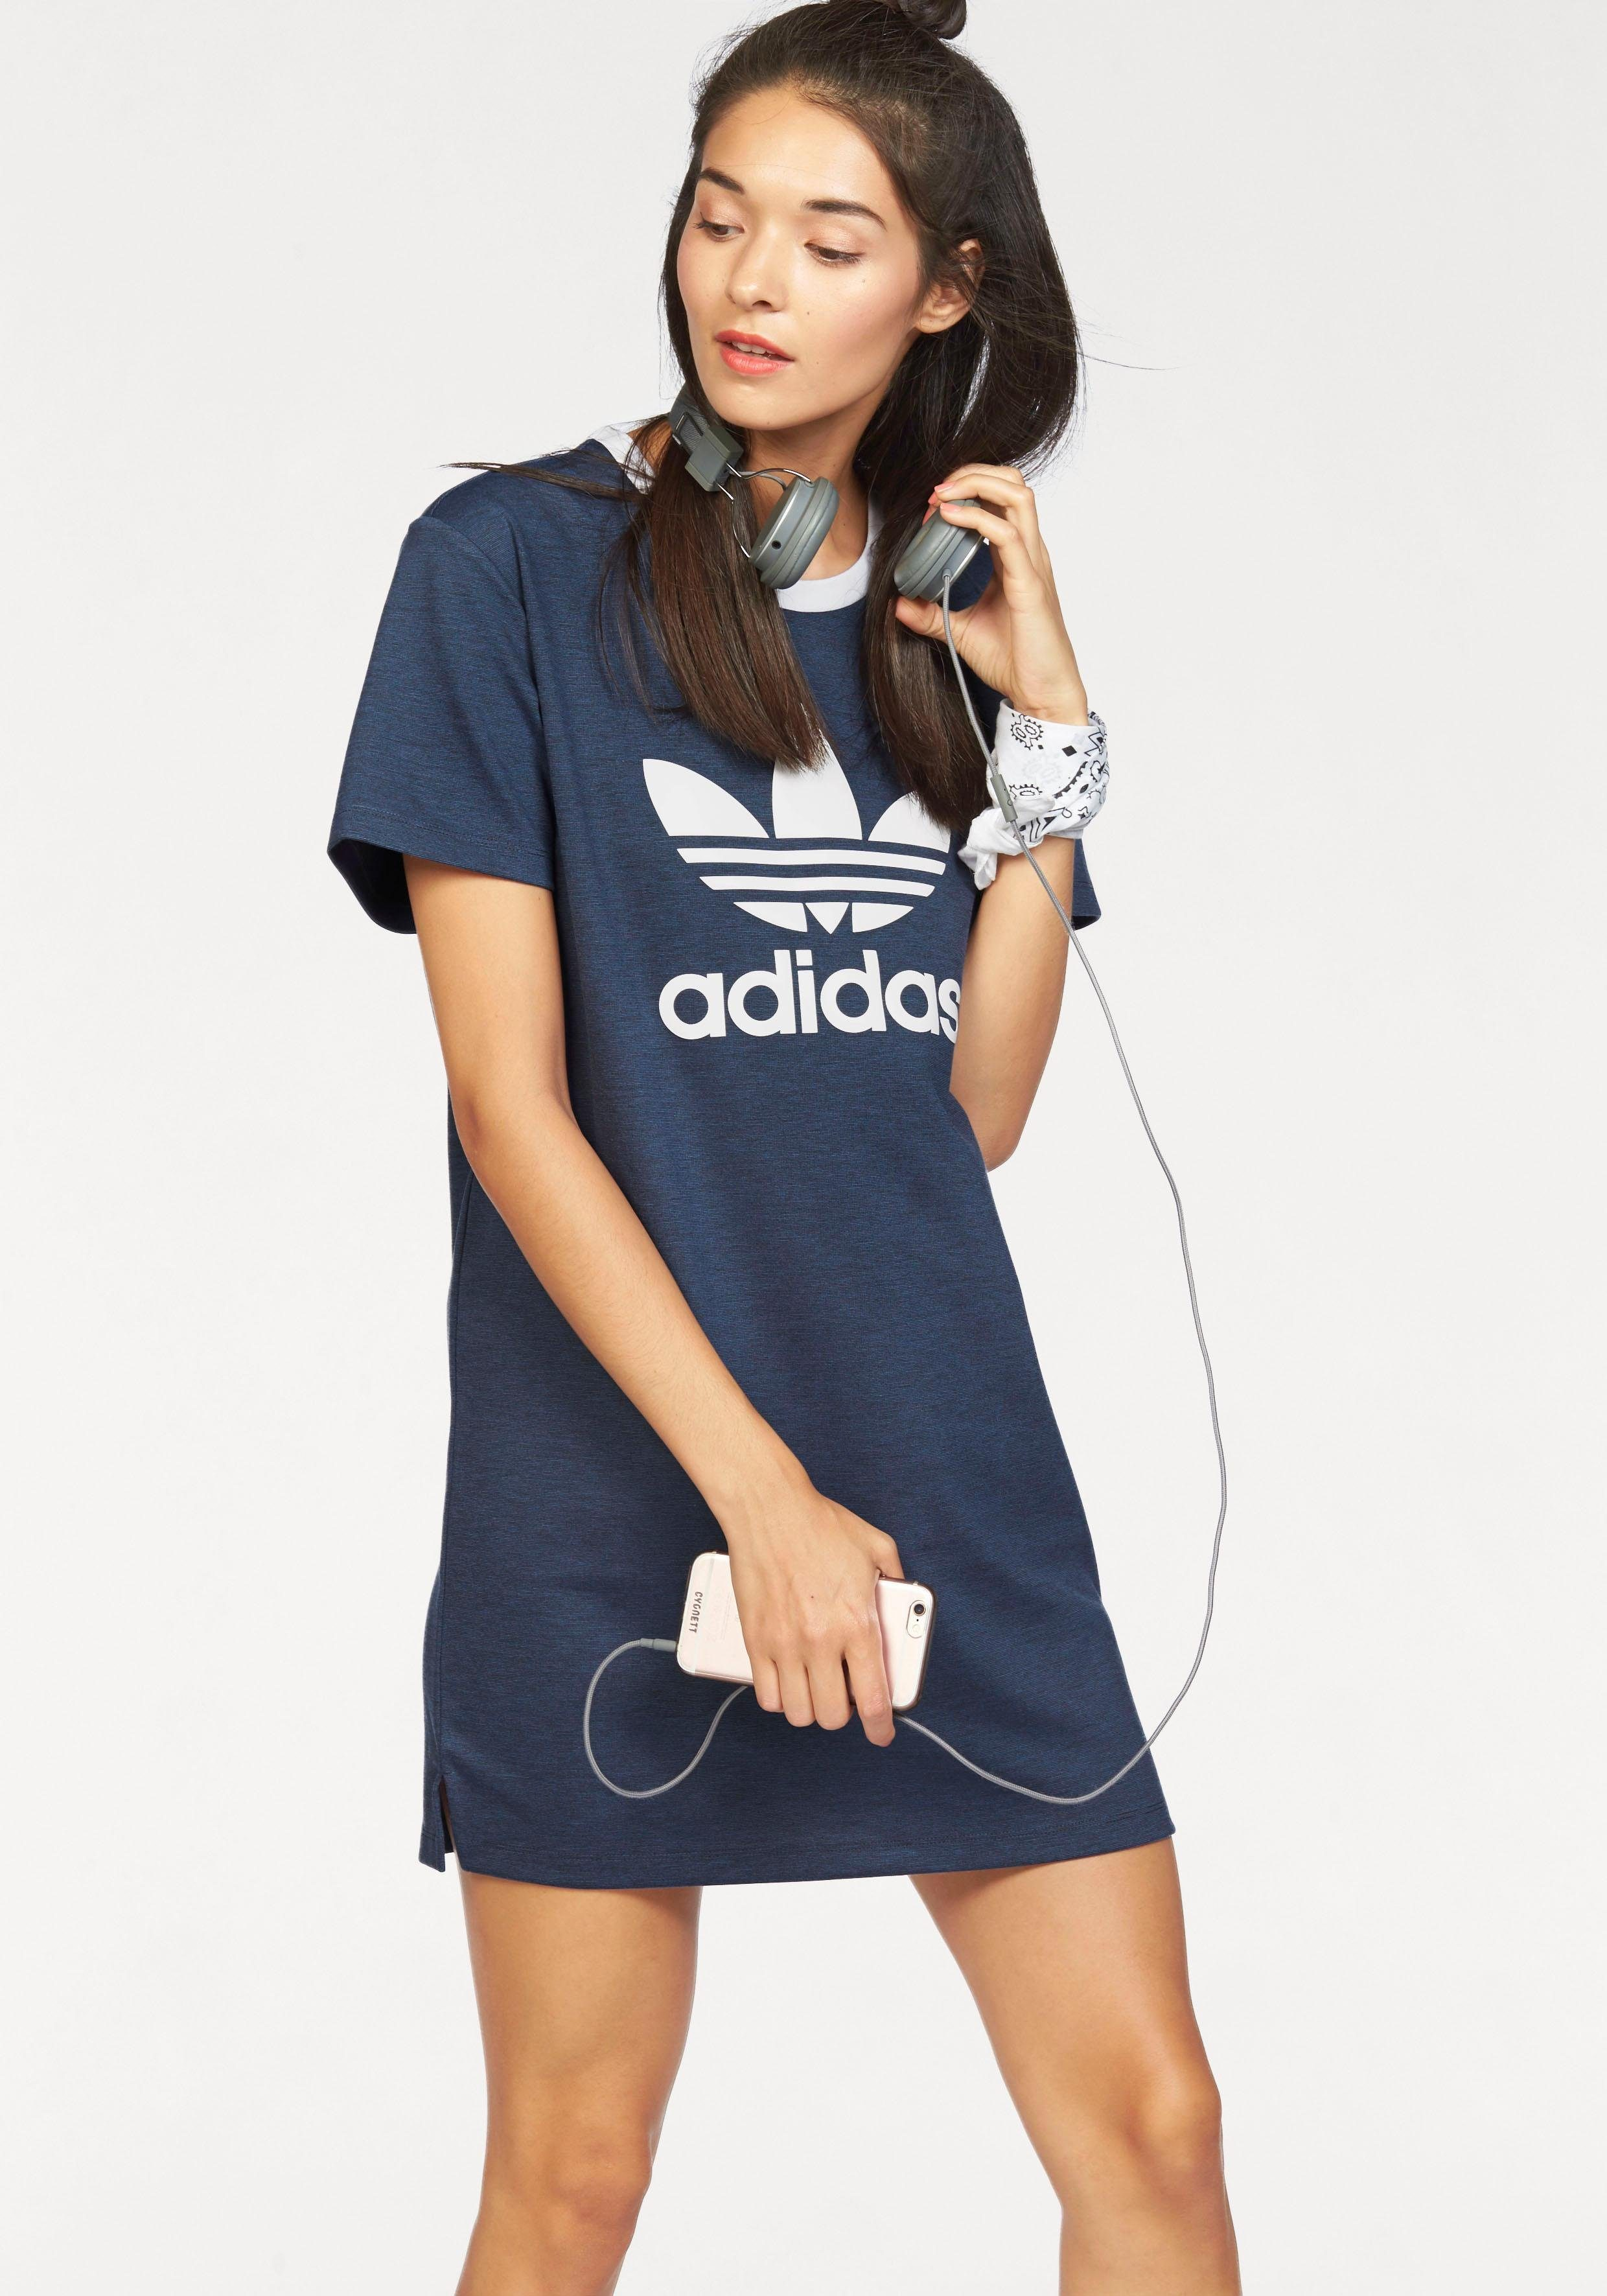 adidas t-shirt kleid